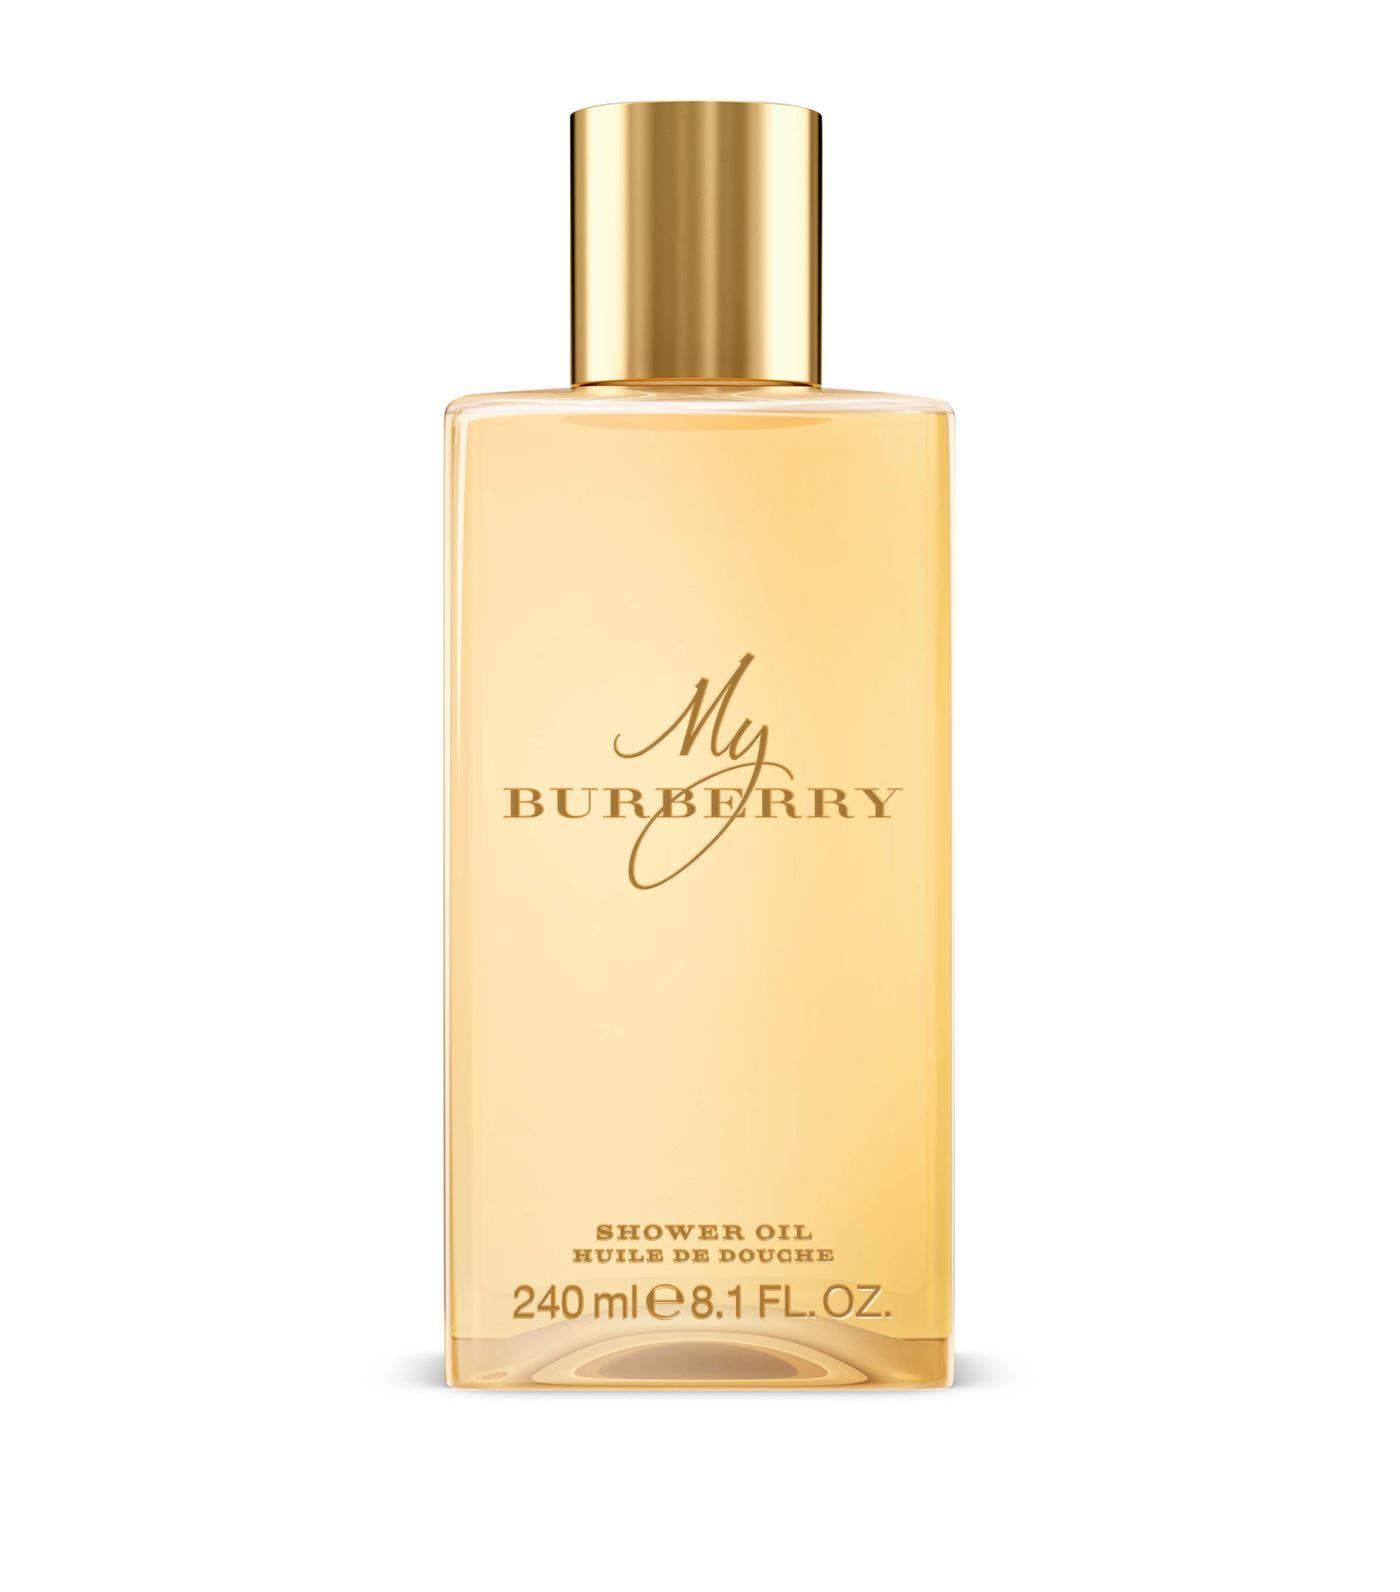 My Burberry Shower Oil 240ml